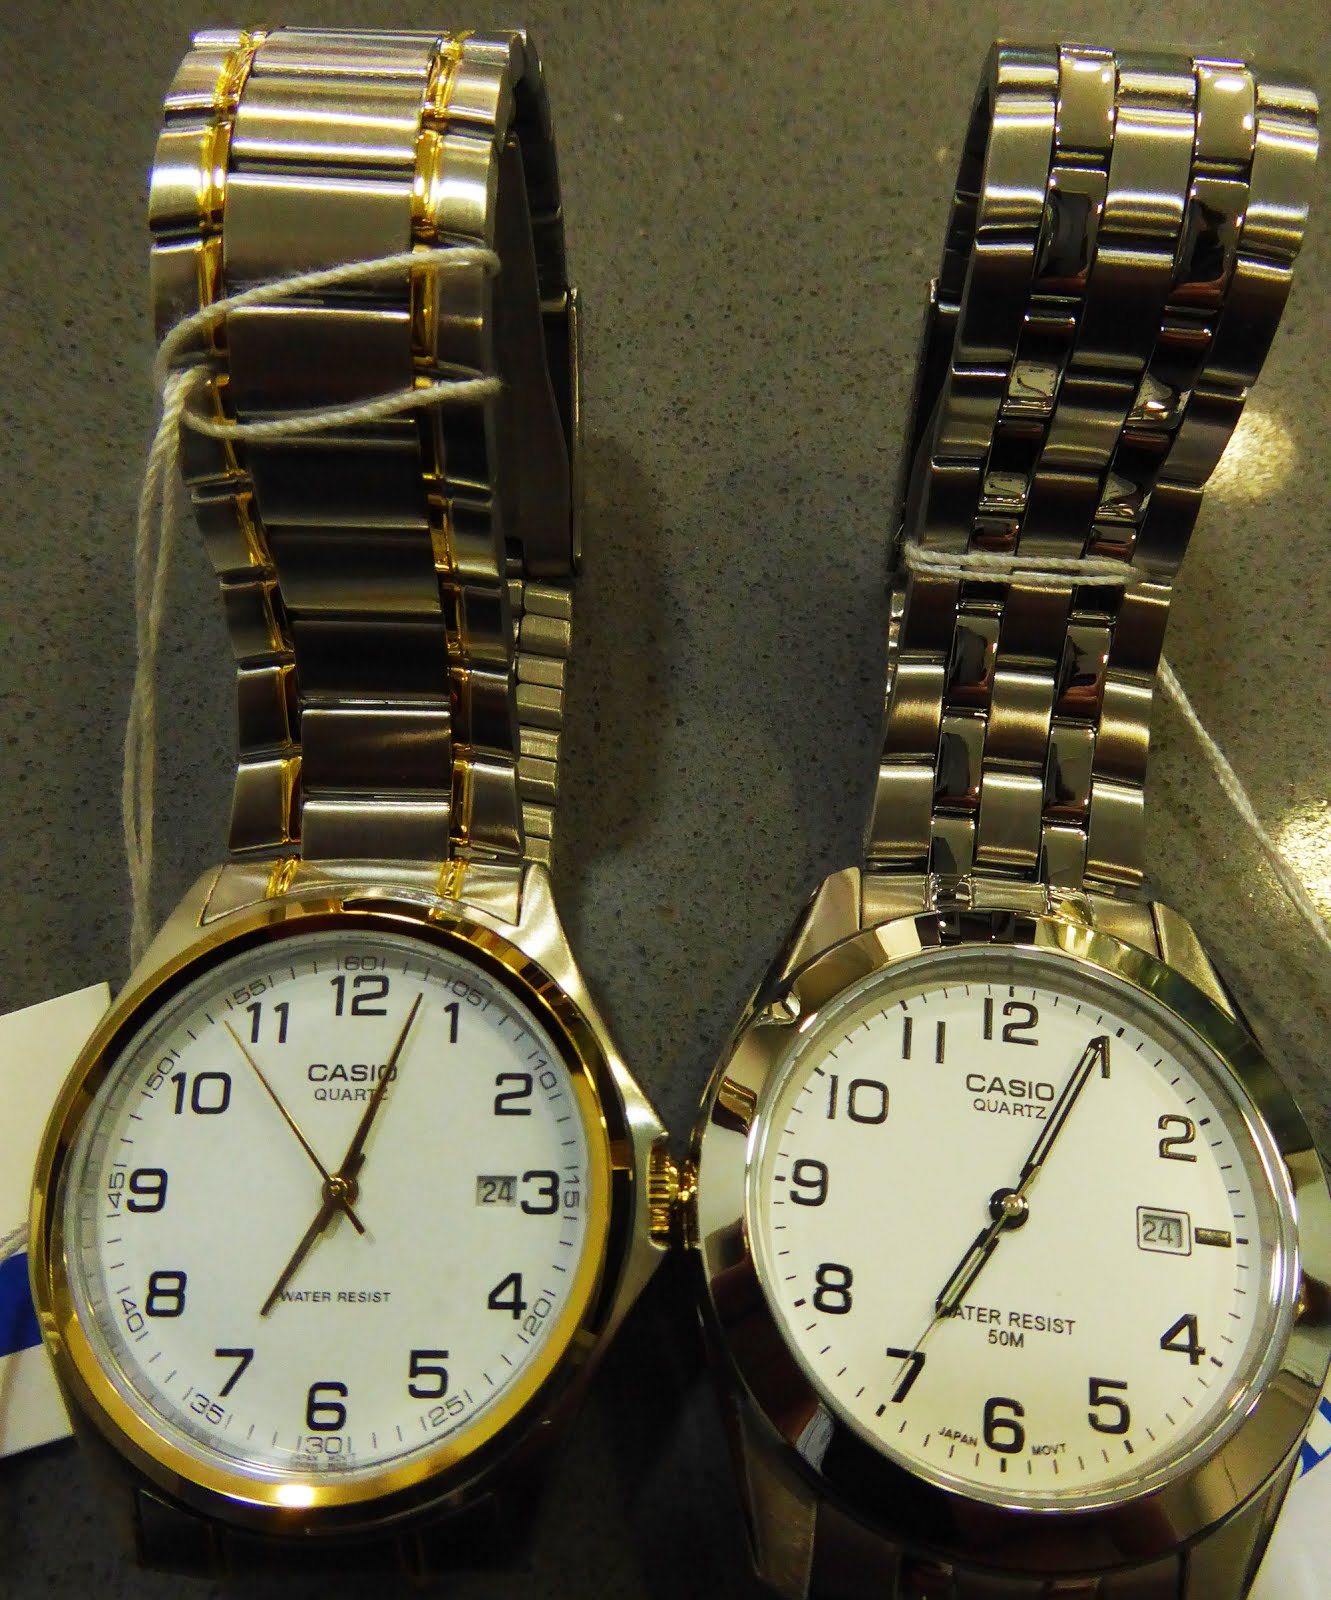 Relojes Casio, army acero plateado o bicolor.